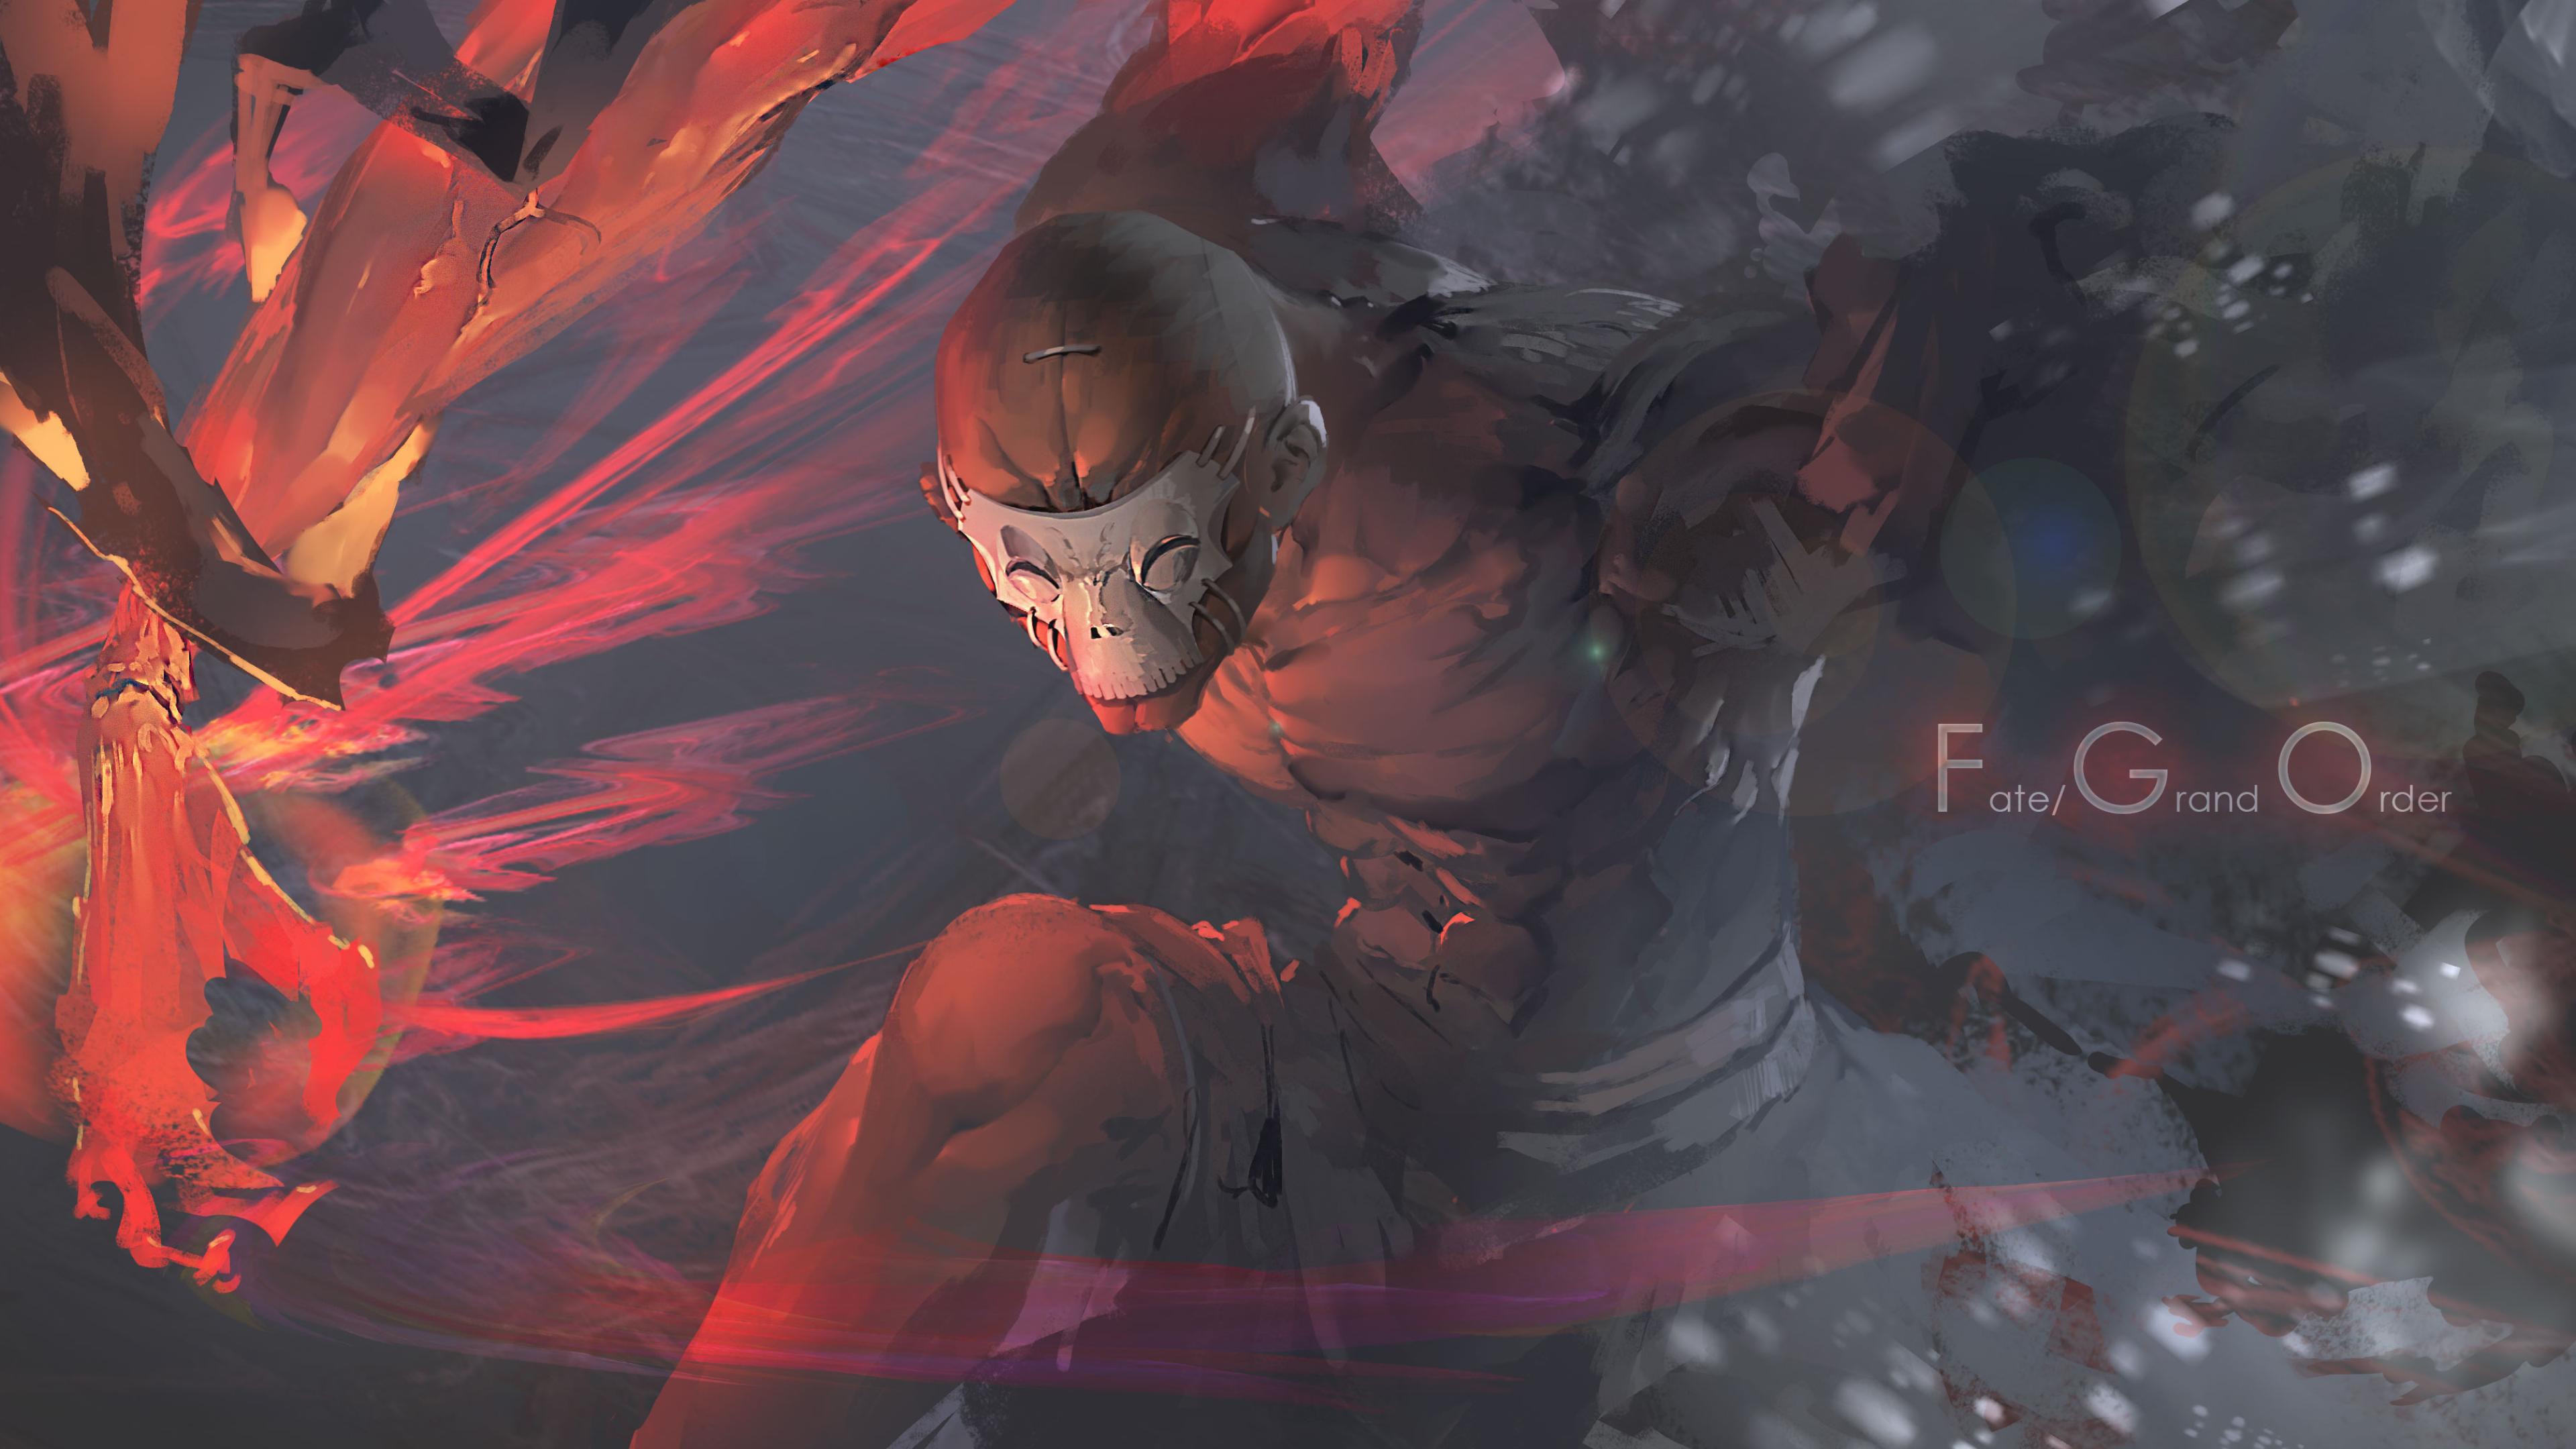 3840x2160 Fate Grand Order Assassin 4k Wallpaper Hd Anime 4k